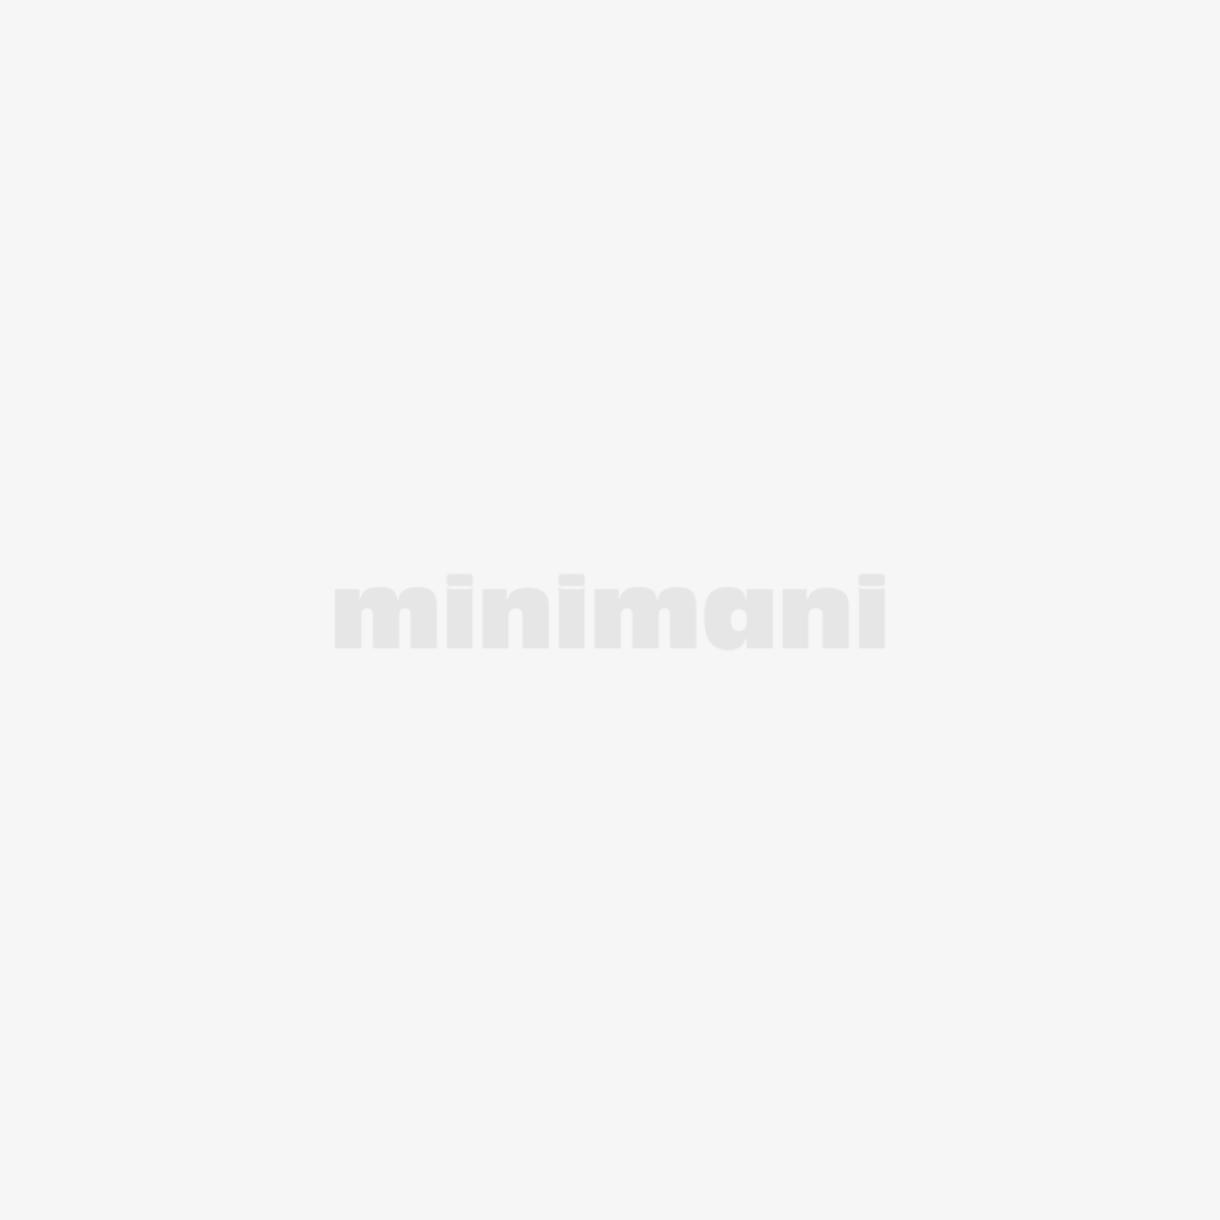 METALTEX FLORENZ SUORAHYLLY 3-OS